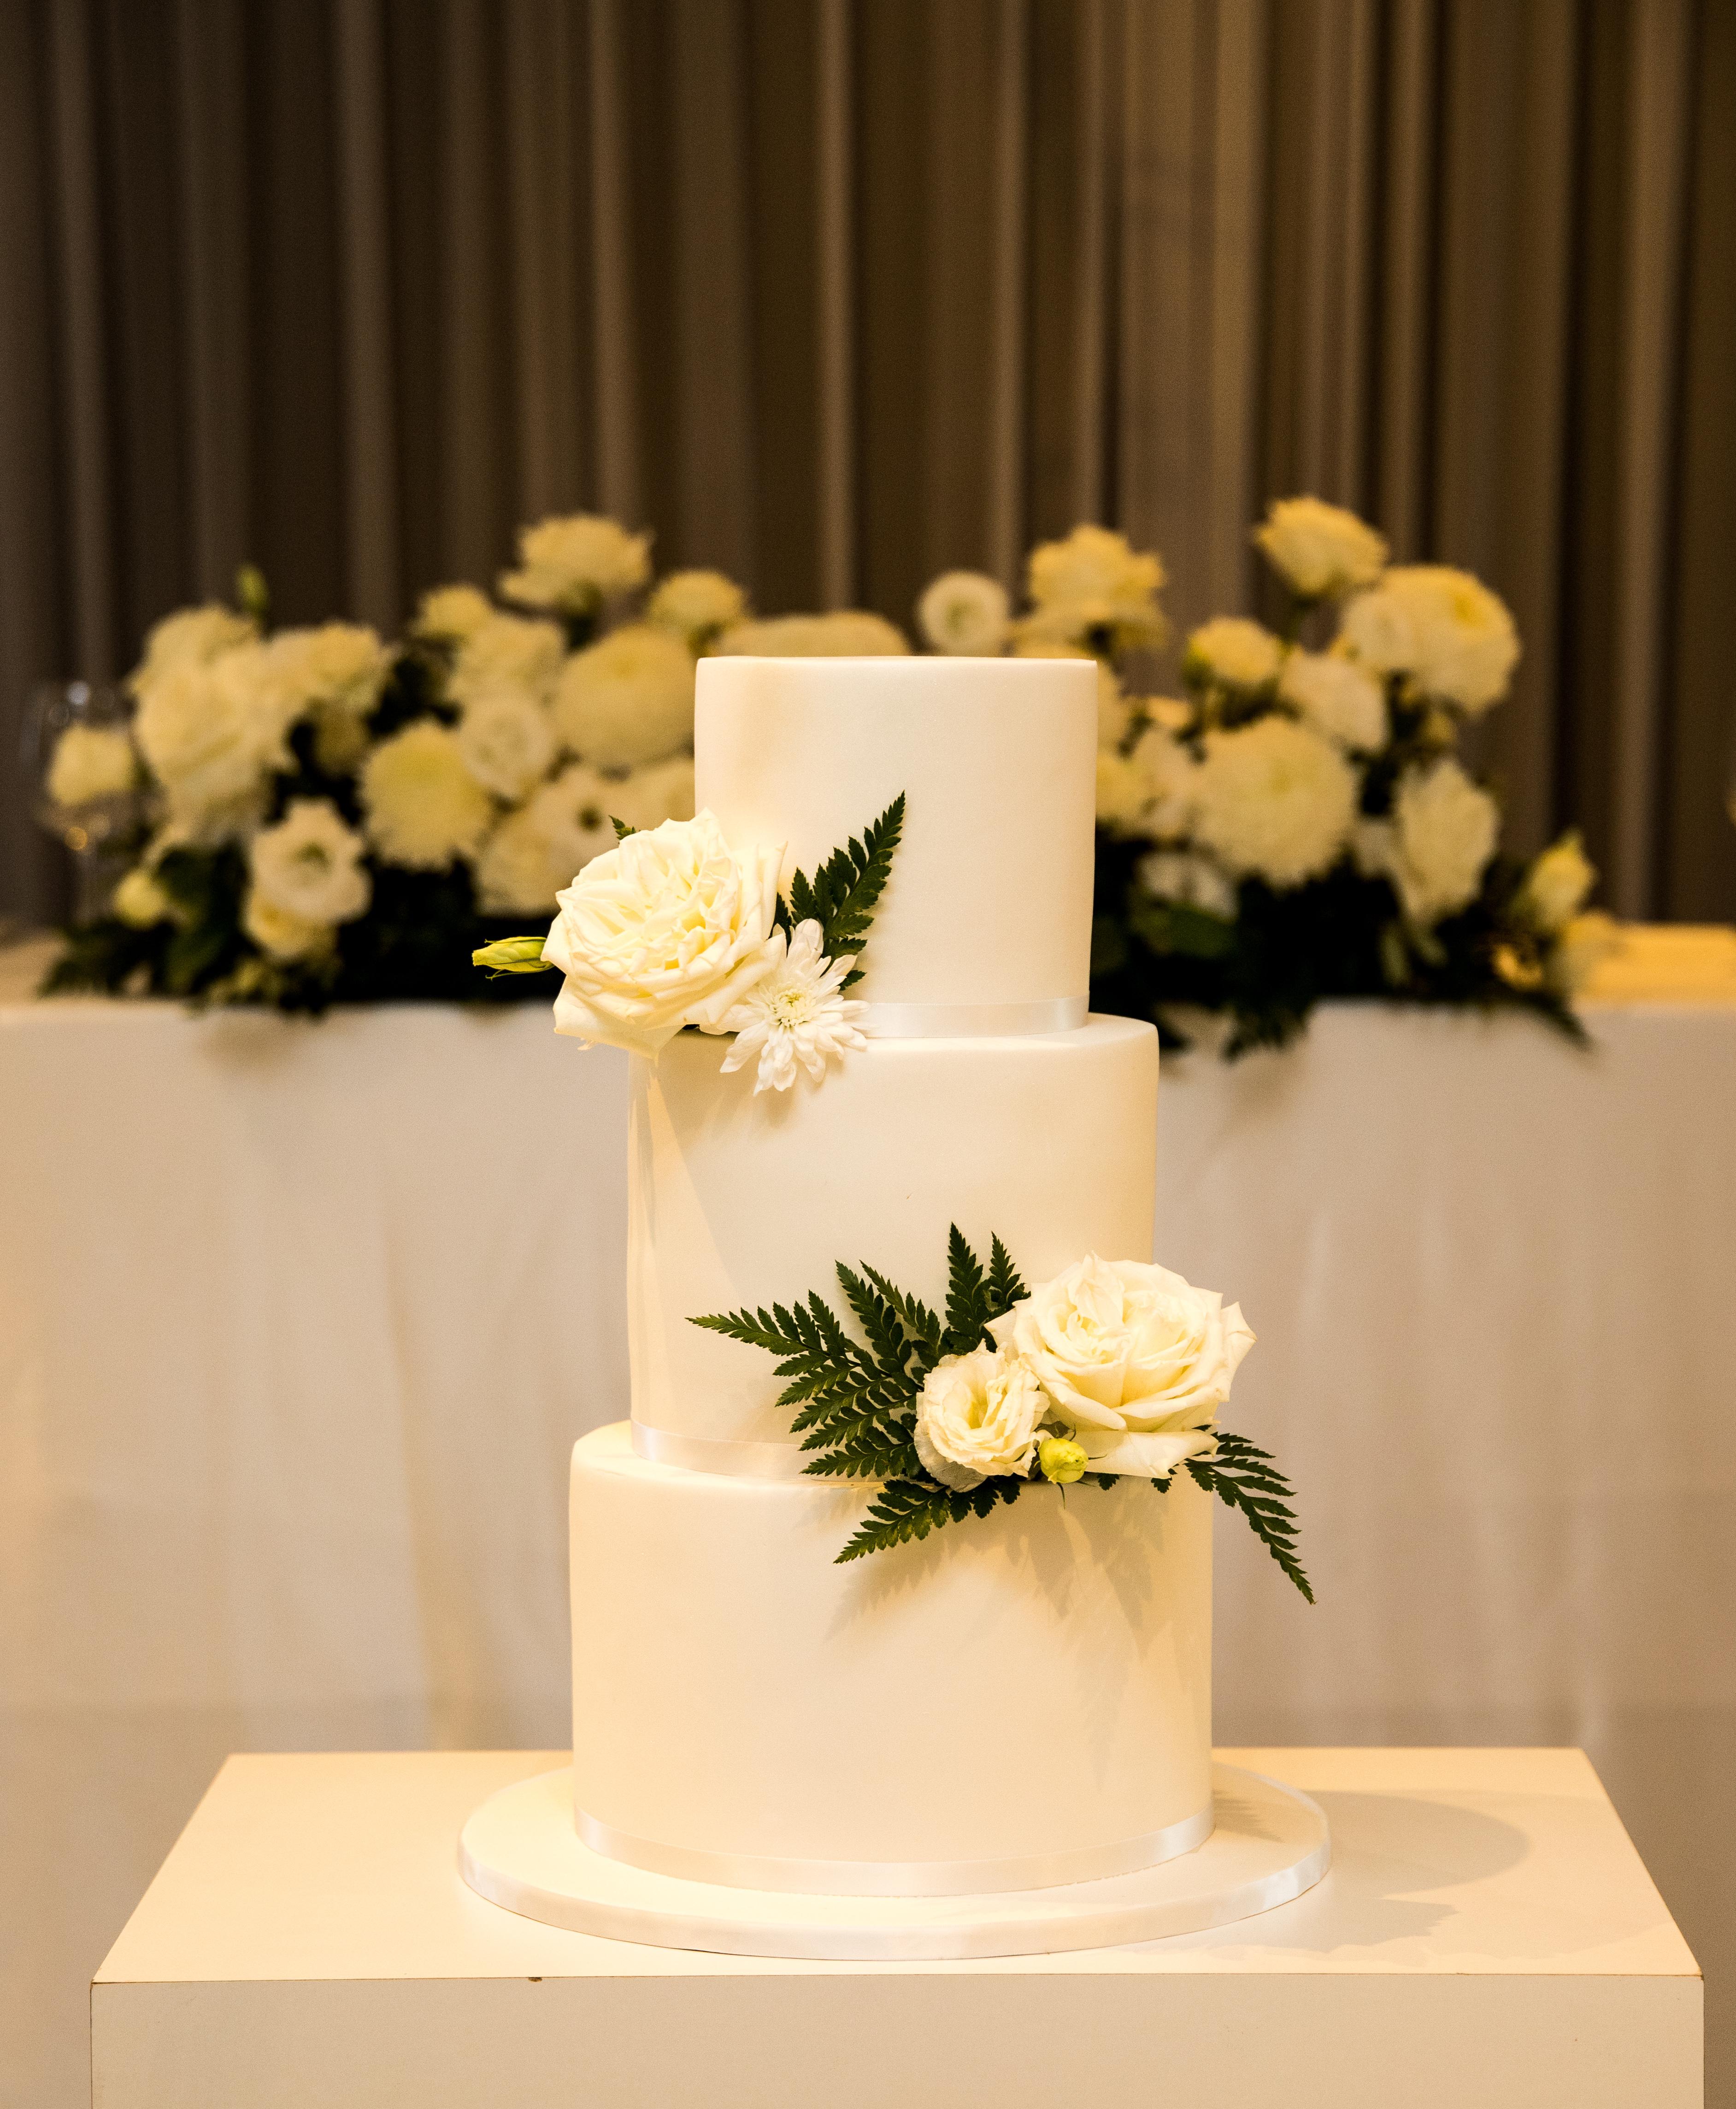 Sydney 3 tier Wedding cake